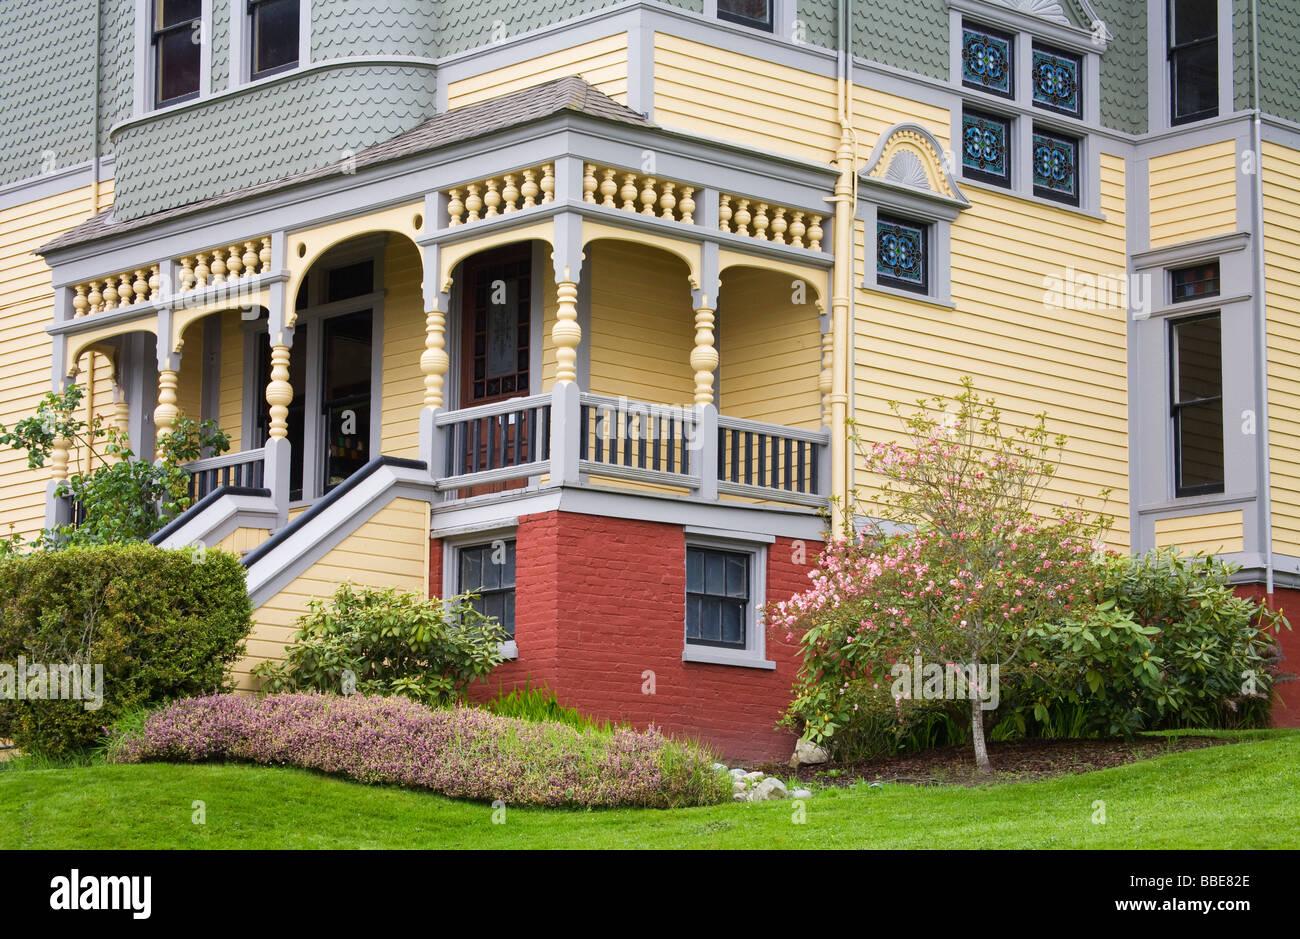 W.M Walker - E.G Ames House; Port Gamble, Washington State, USA - Stock Image